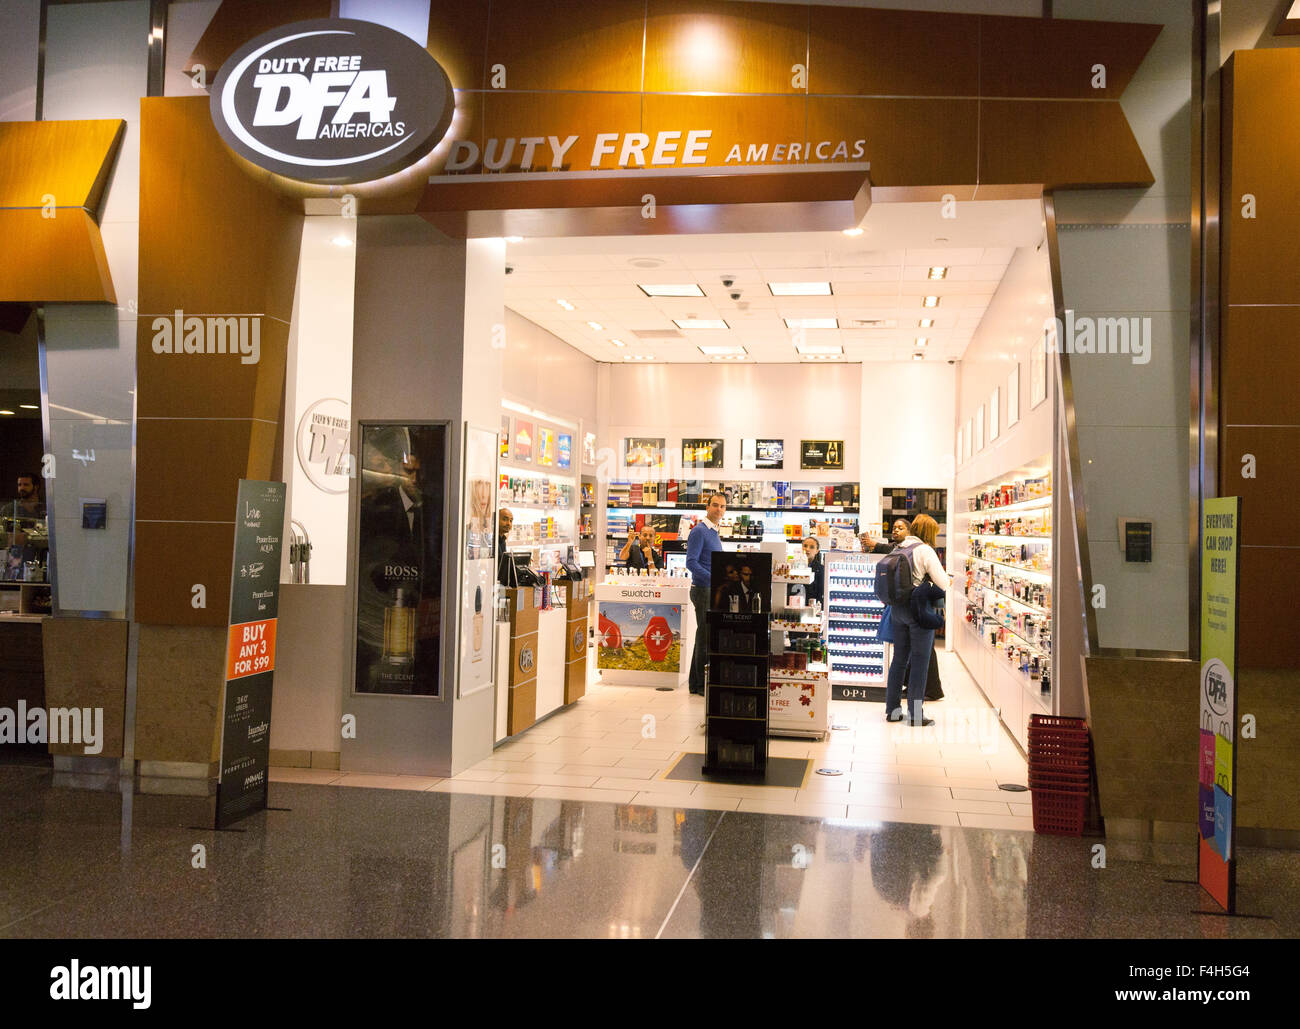 Duty Free Americas Duty Free shop, Departures, Terminal A, Logan international Airport, Boston, Massachusetts USA - Stock Image